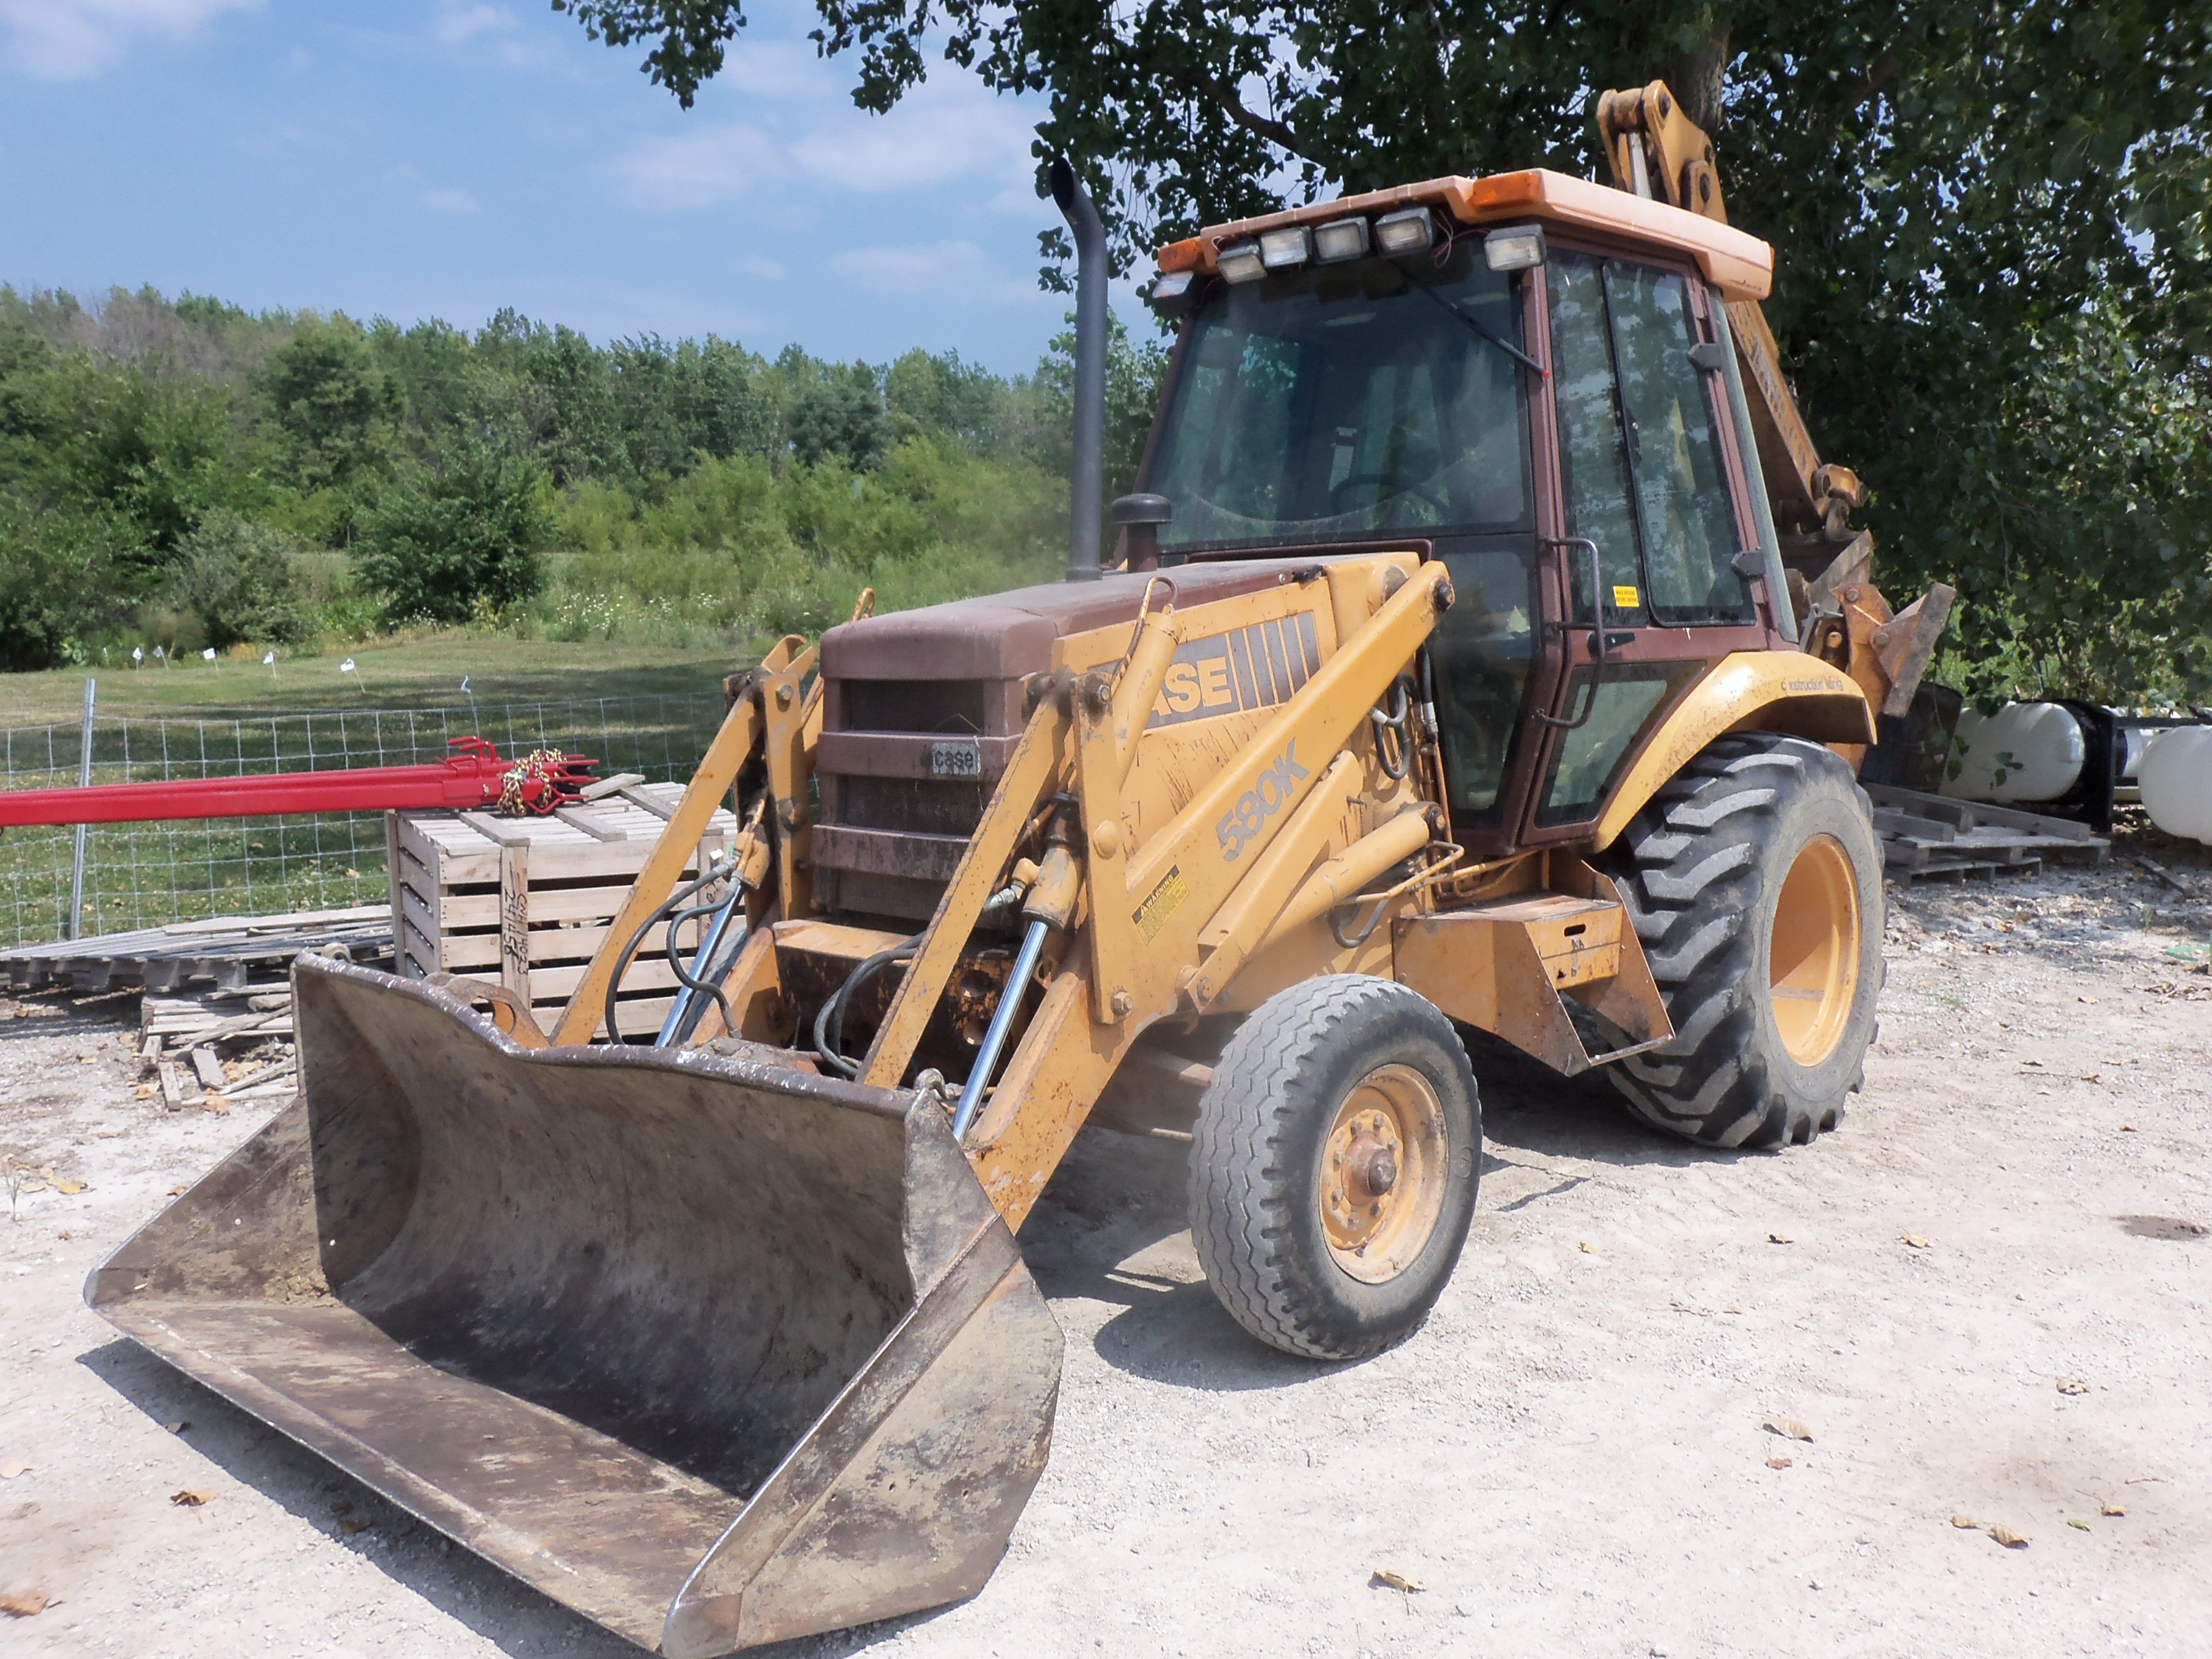 Case 580sk Tractor Loader Backhoe Service Repair Manual Download